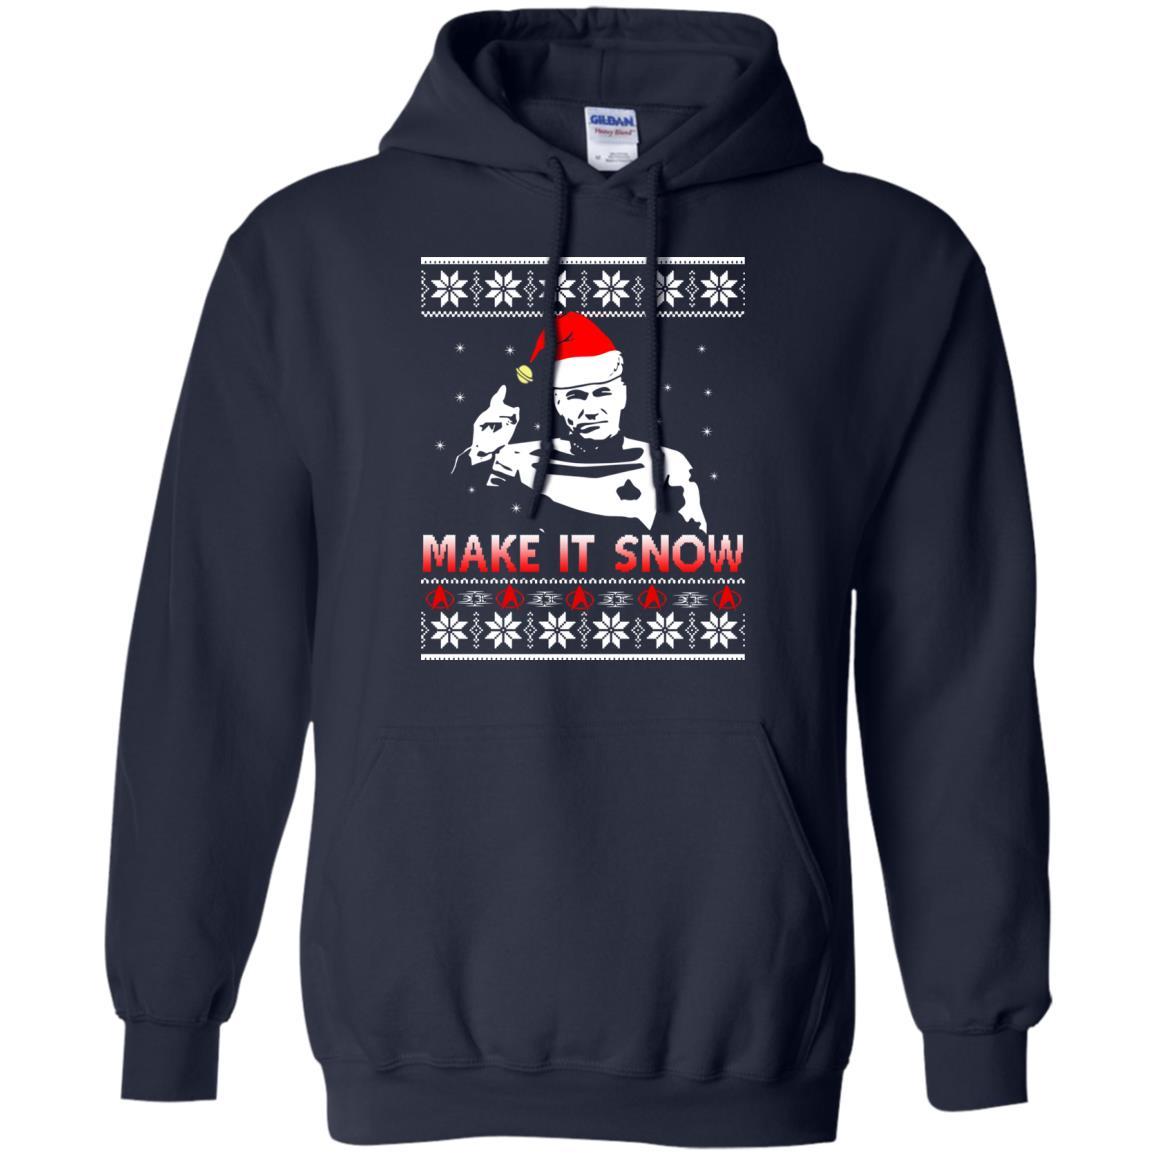 image 2411 - Star Trek make it snow Christmas Sweater, Shirt